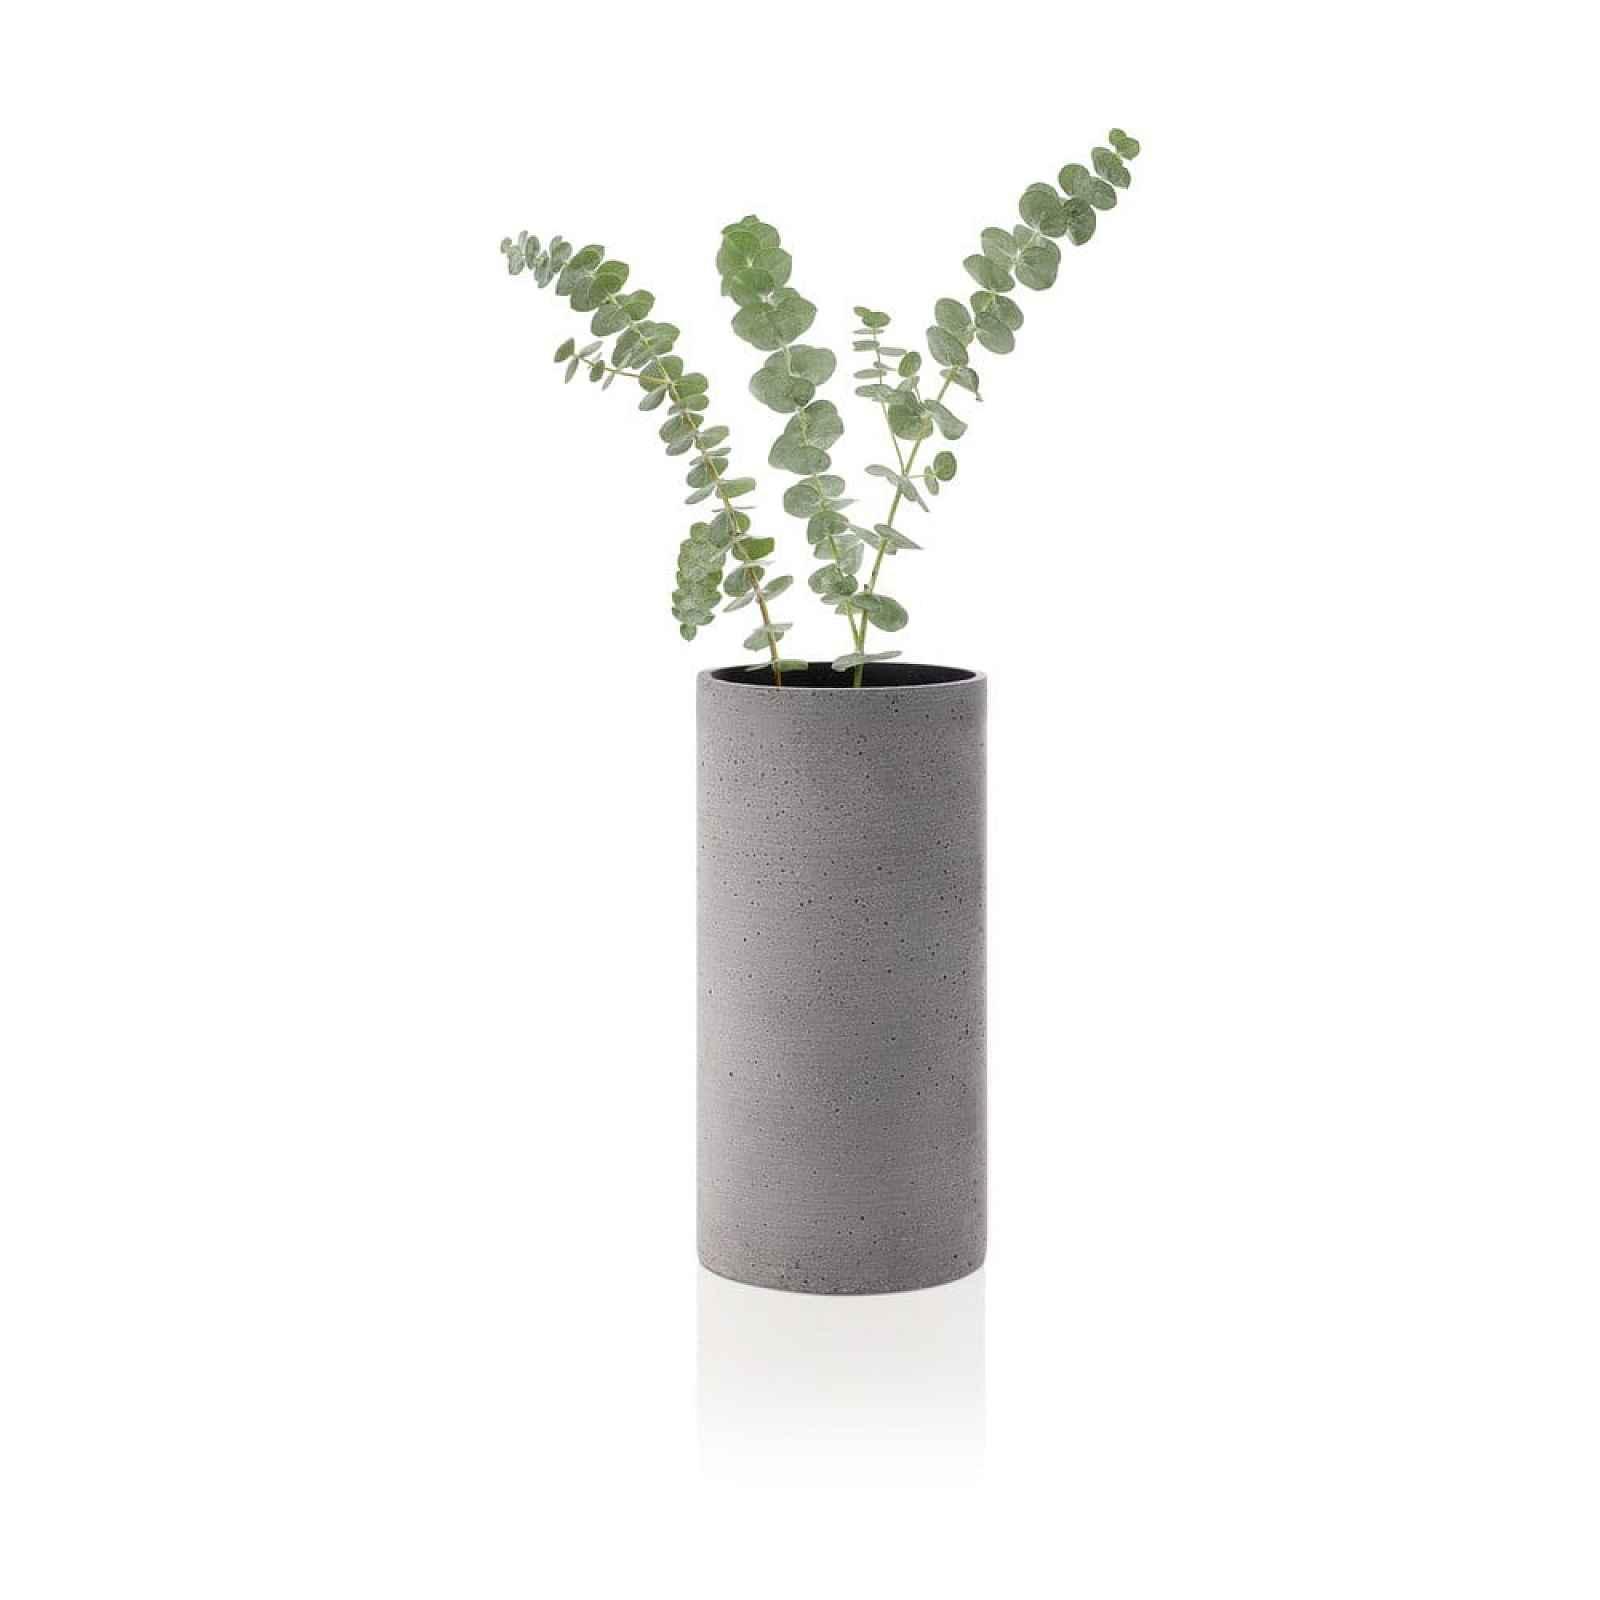 Šedá váza Blomus Bouquet,výška24cm